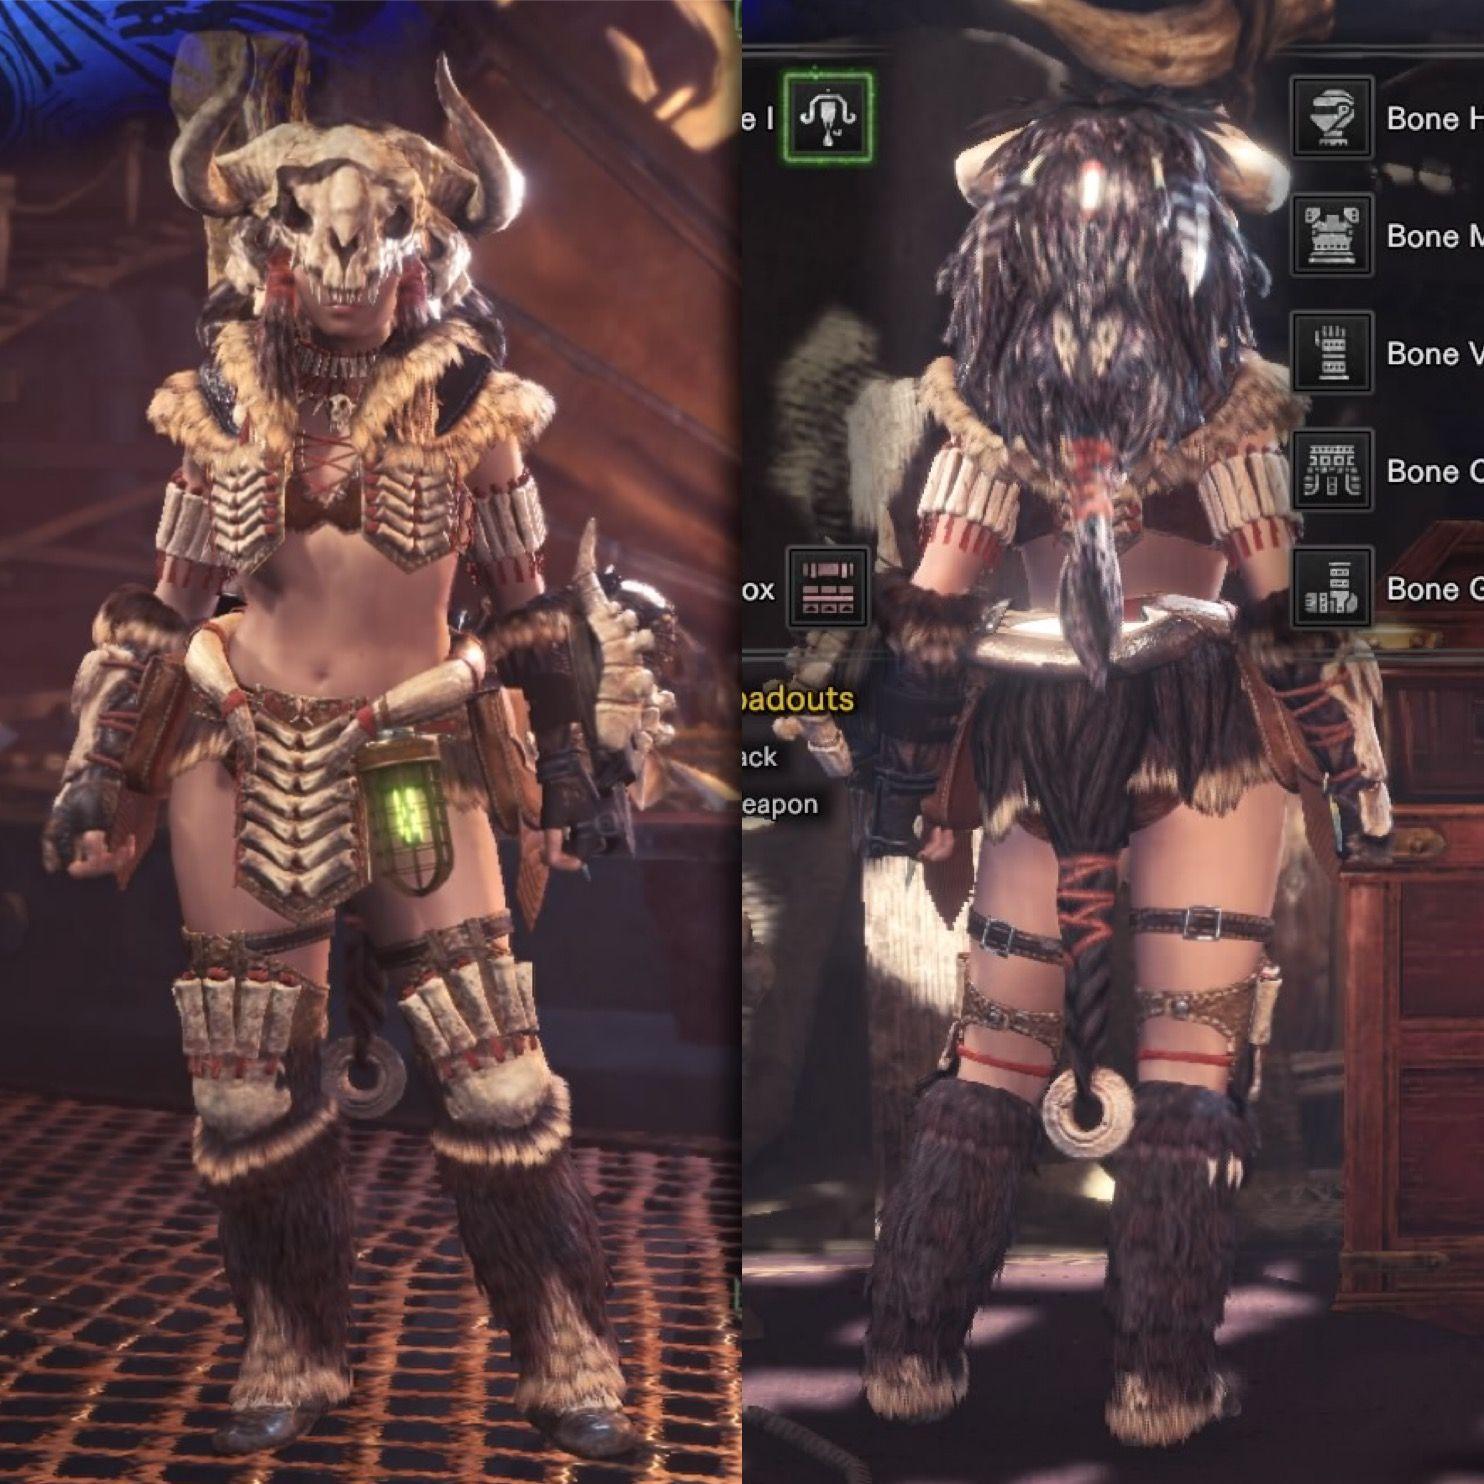 Monster Hunter World Bone Armor Best Image I Could Get Of The